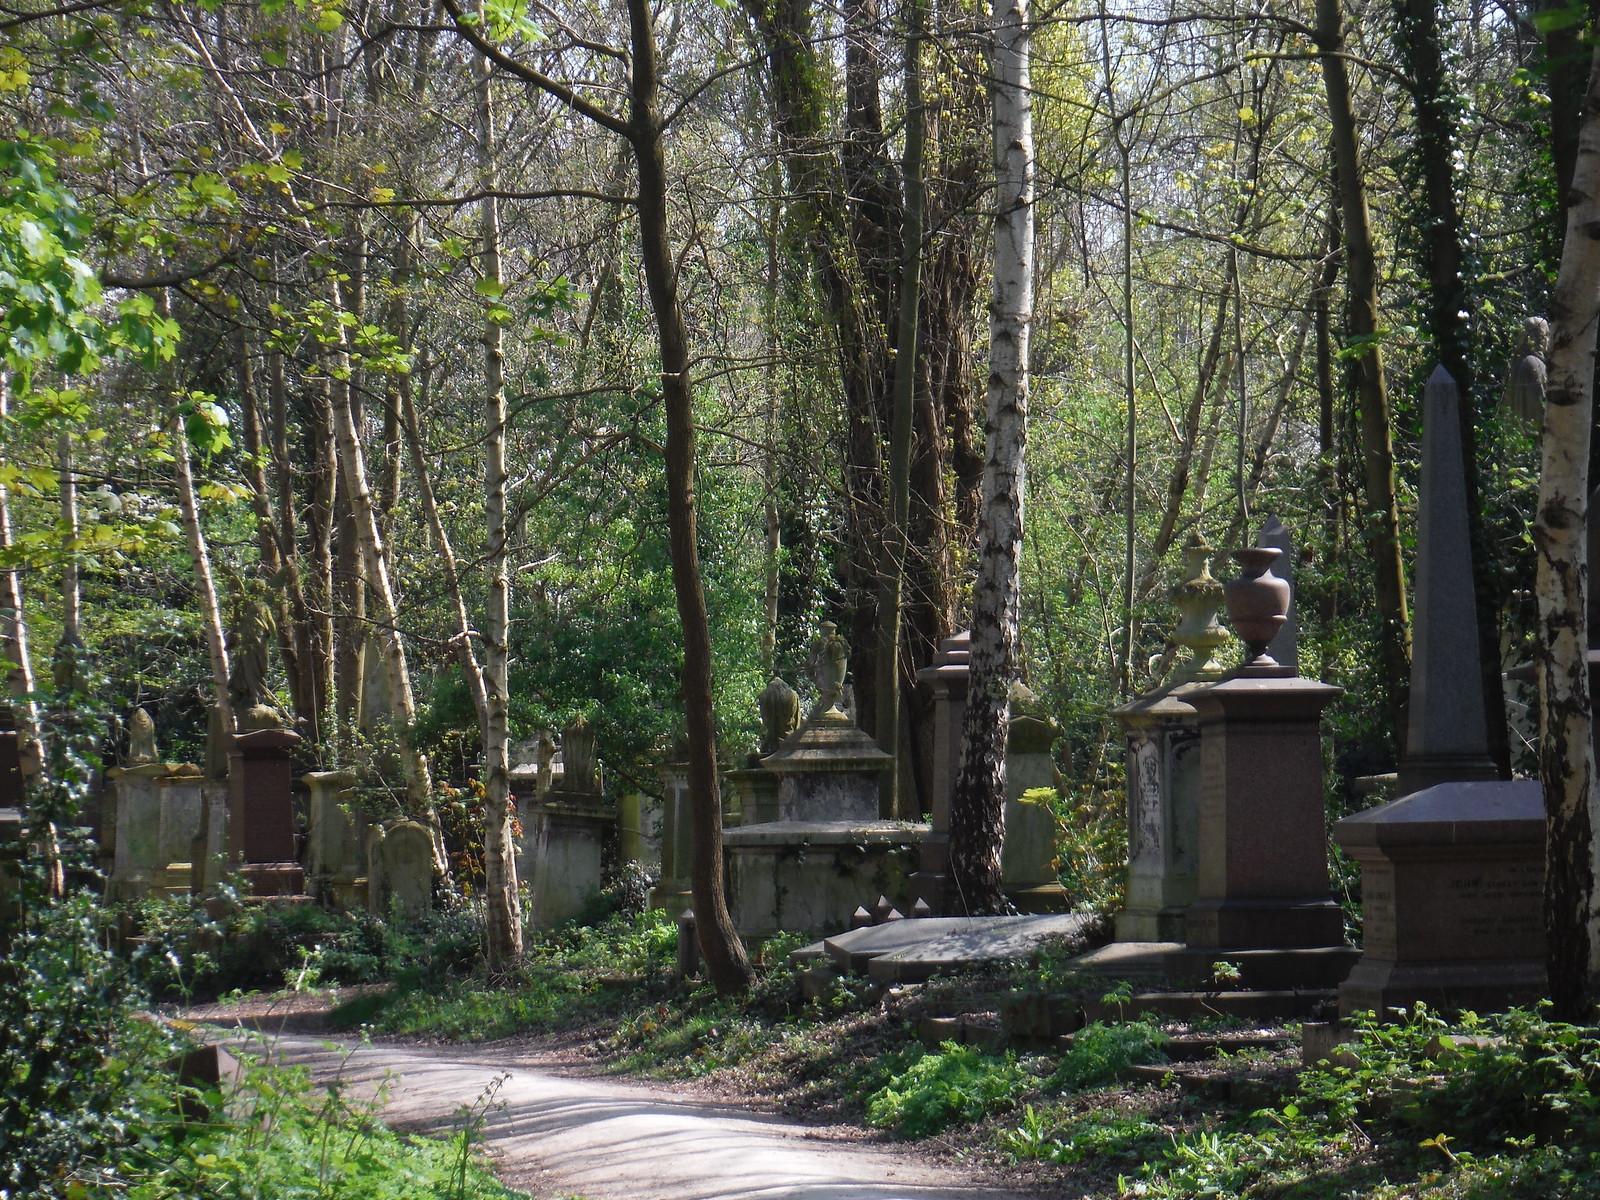 Abney Park Cemetery (VI) SWC Short Walk 26 - Woodberry Wetlands (Stoke Newington Reservoirs)